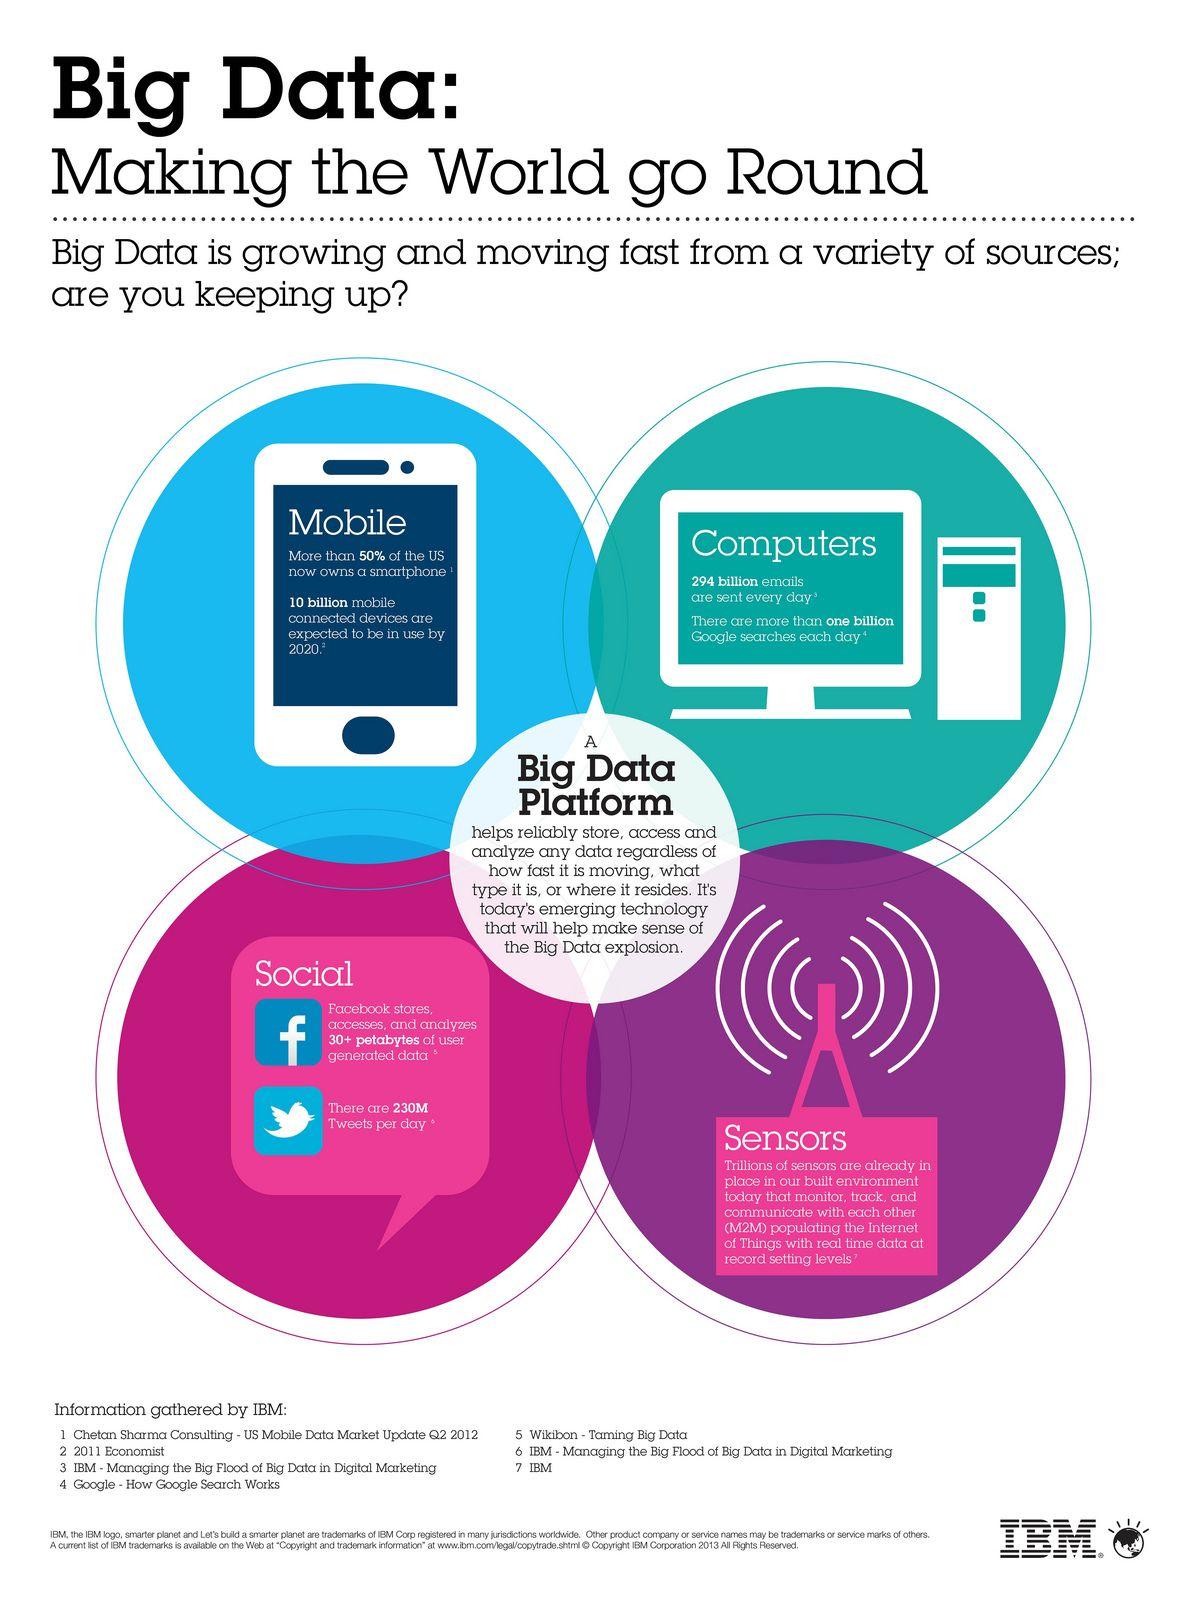 Ibm Announces New Innovations For Tackling Big Data Big Data Big Data Infographic Big Data Technologies